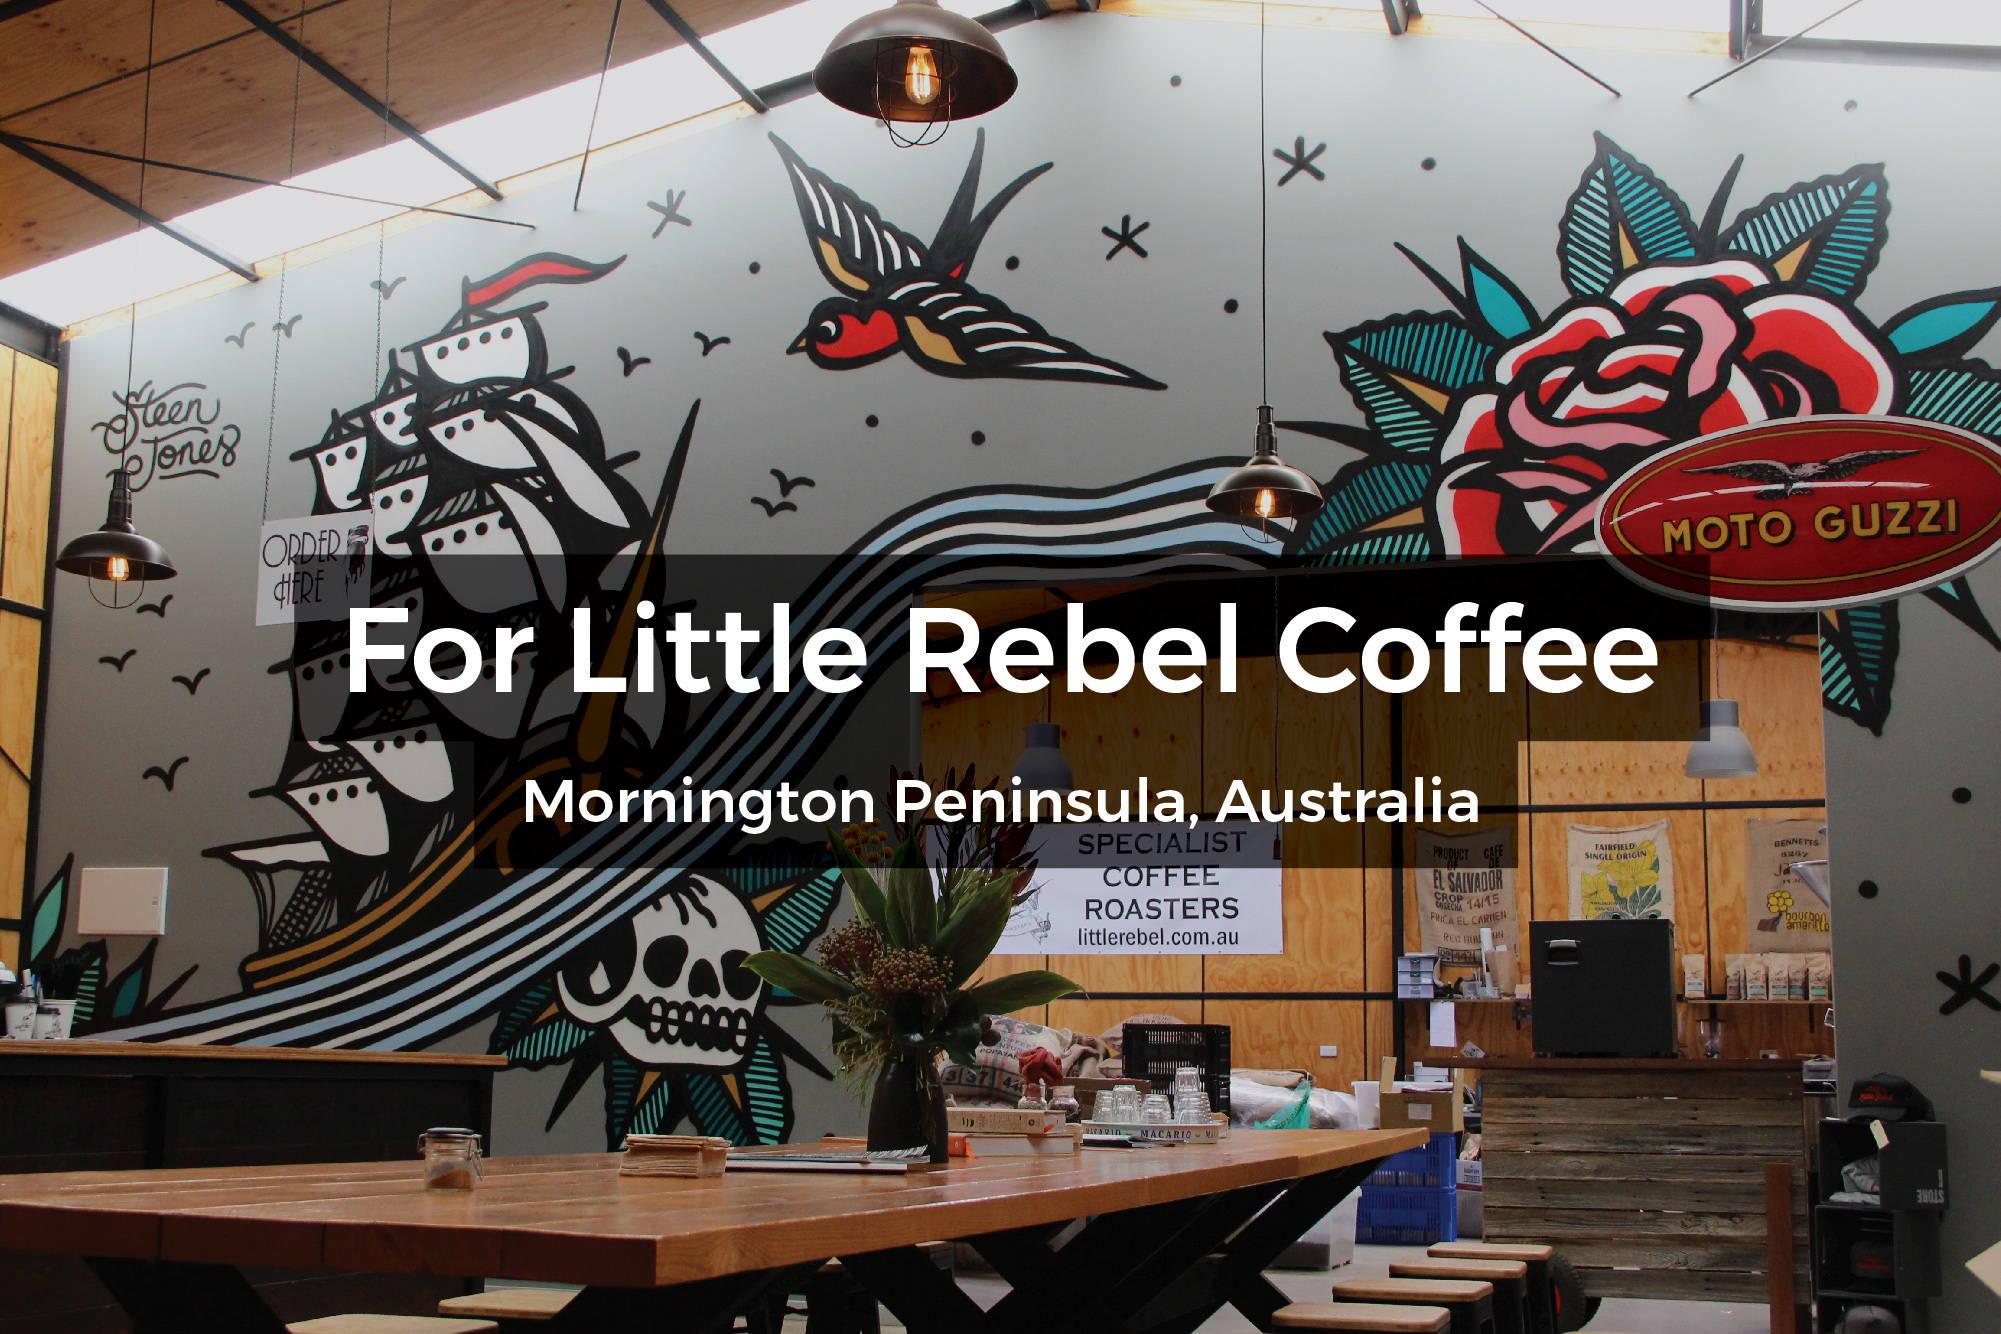 Little Rebel Coffee mural on the Mornington Peninsula, Australia by Steen Jones